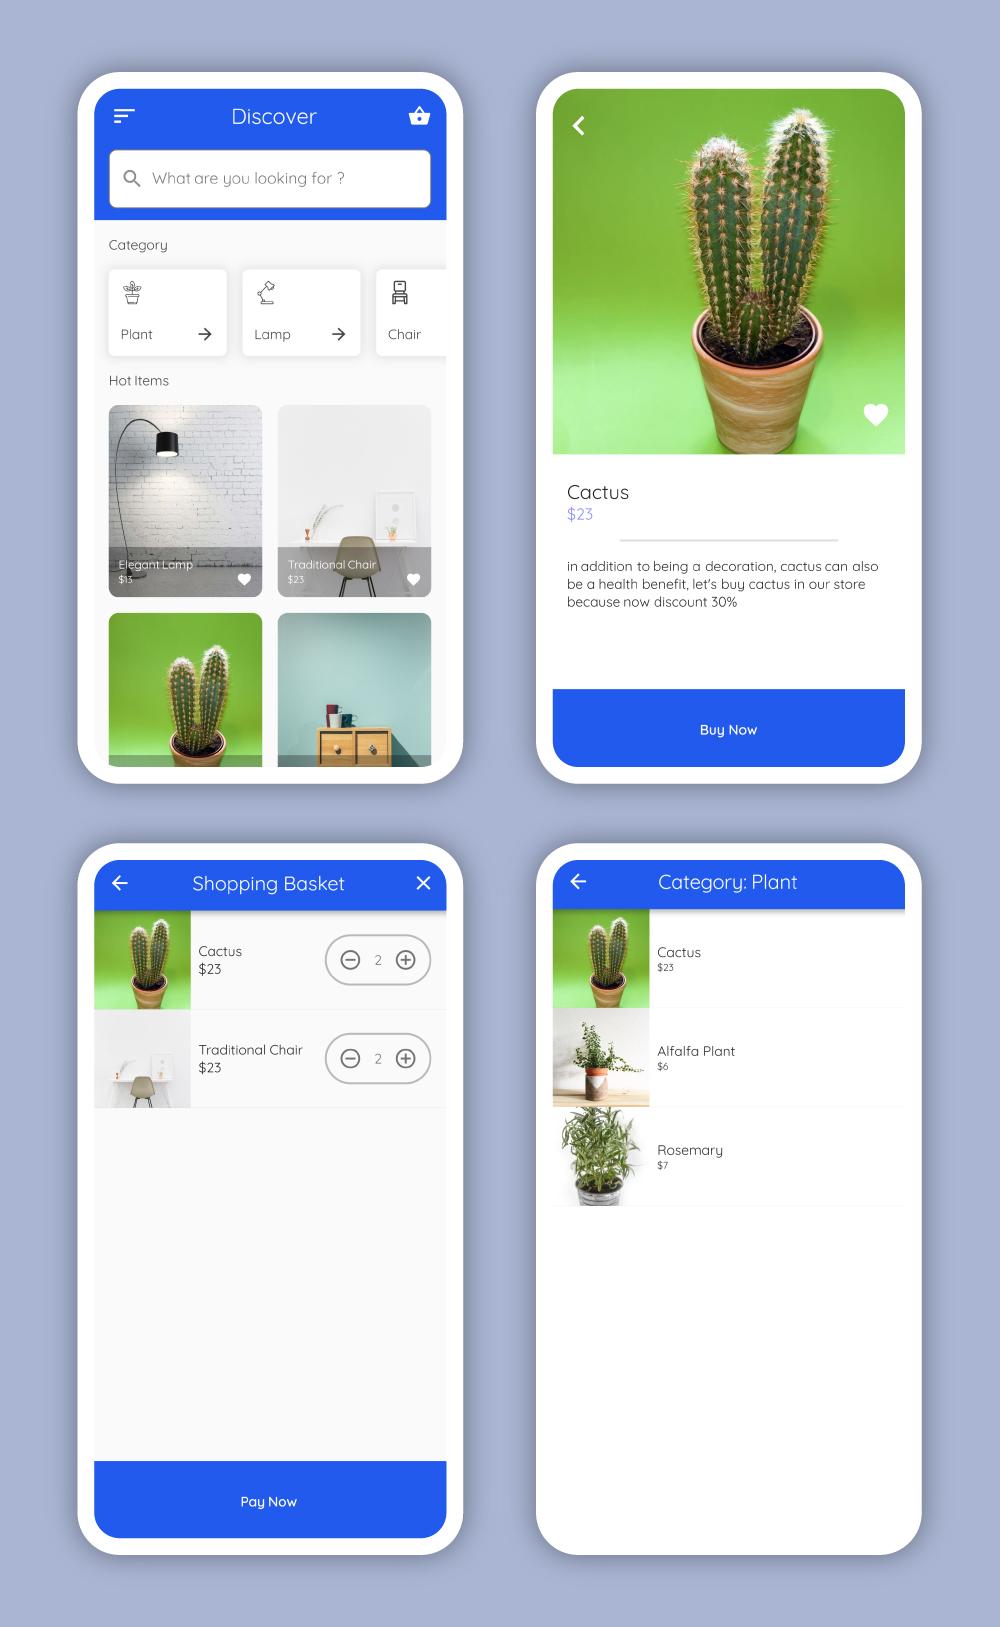 GitHub - mevans/flutter-furniture: A concept app based on